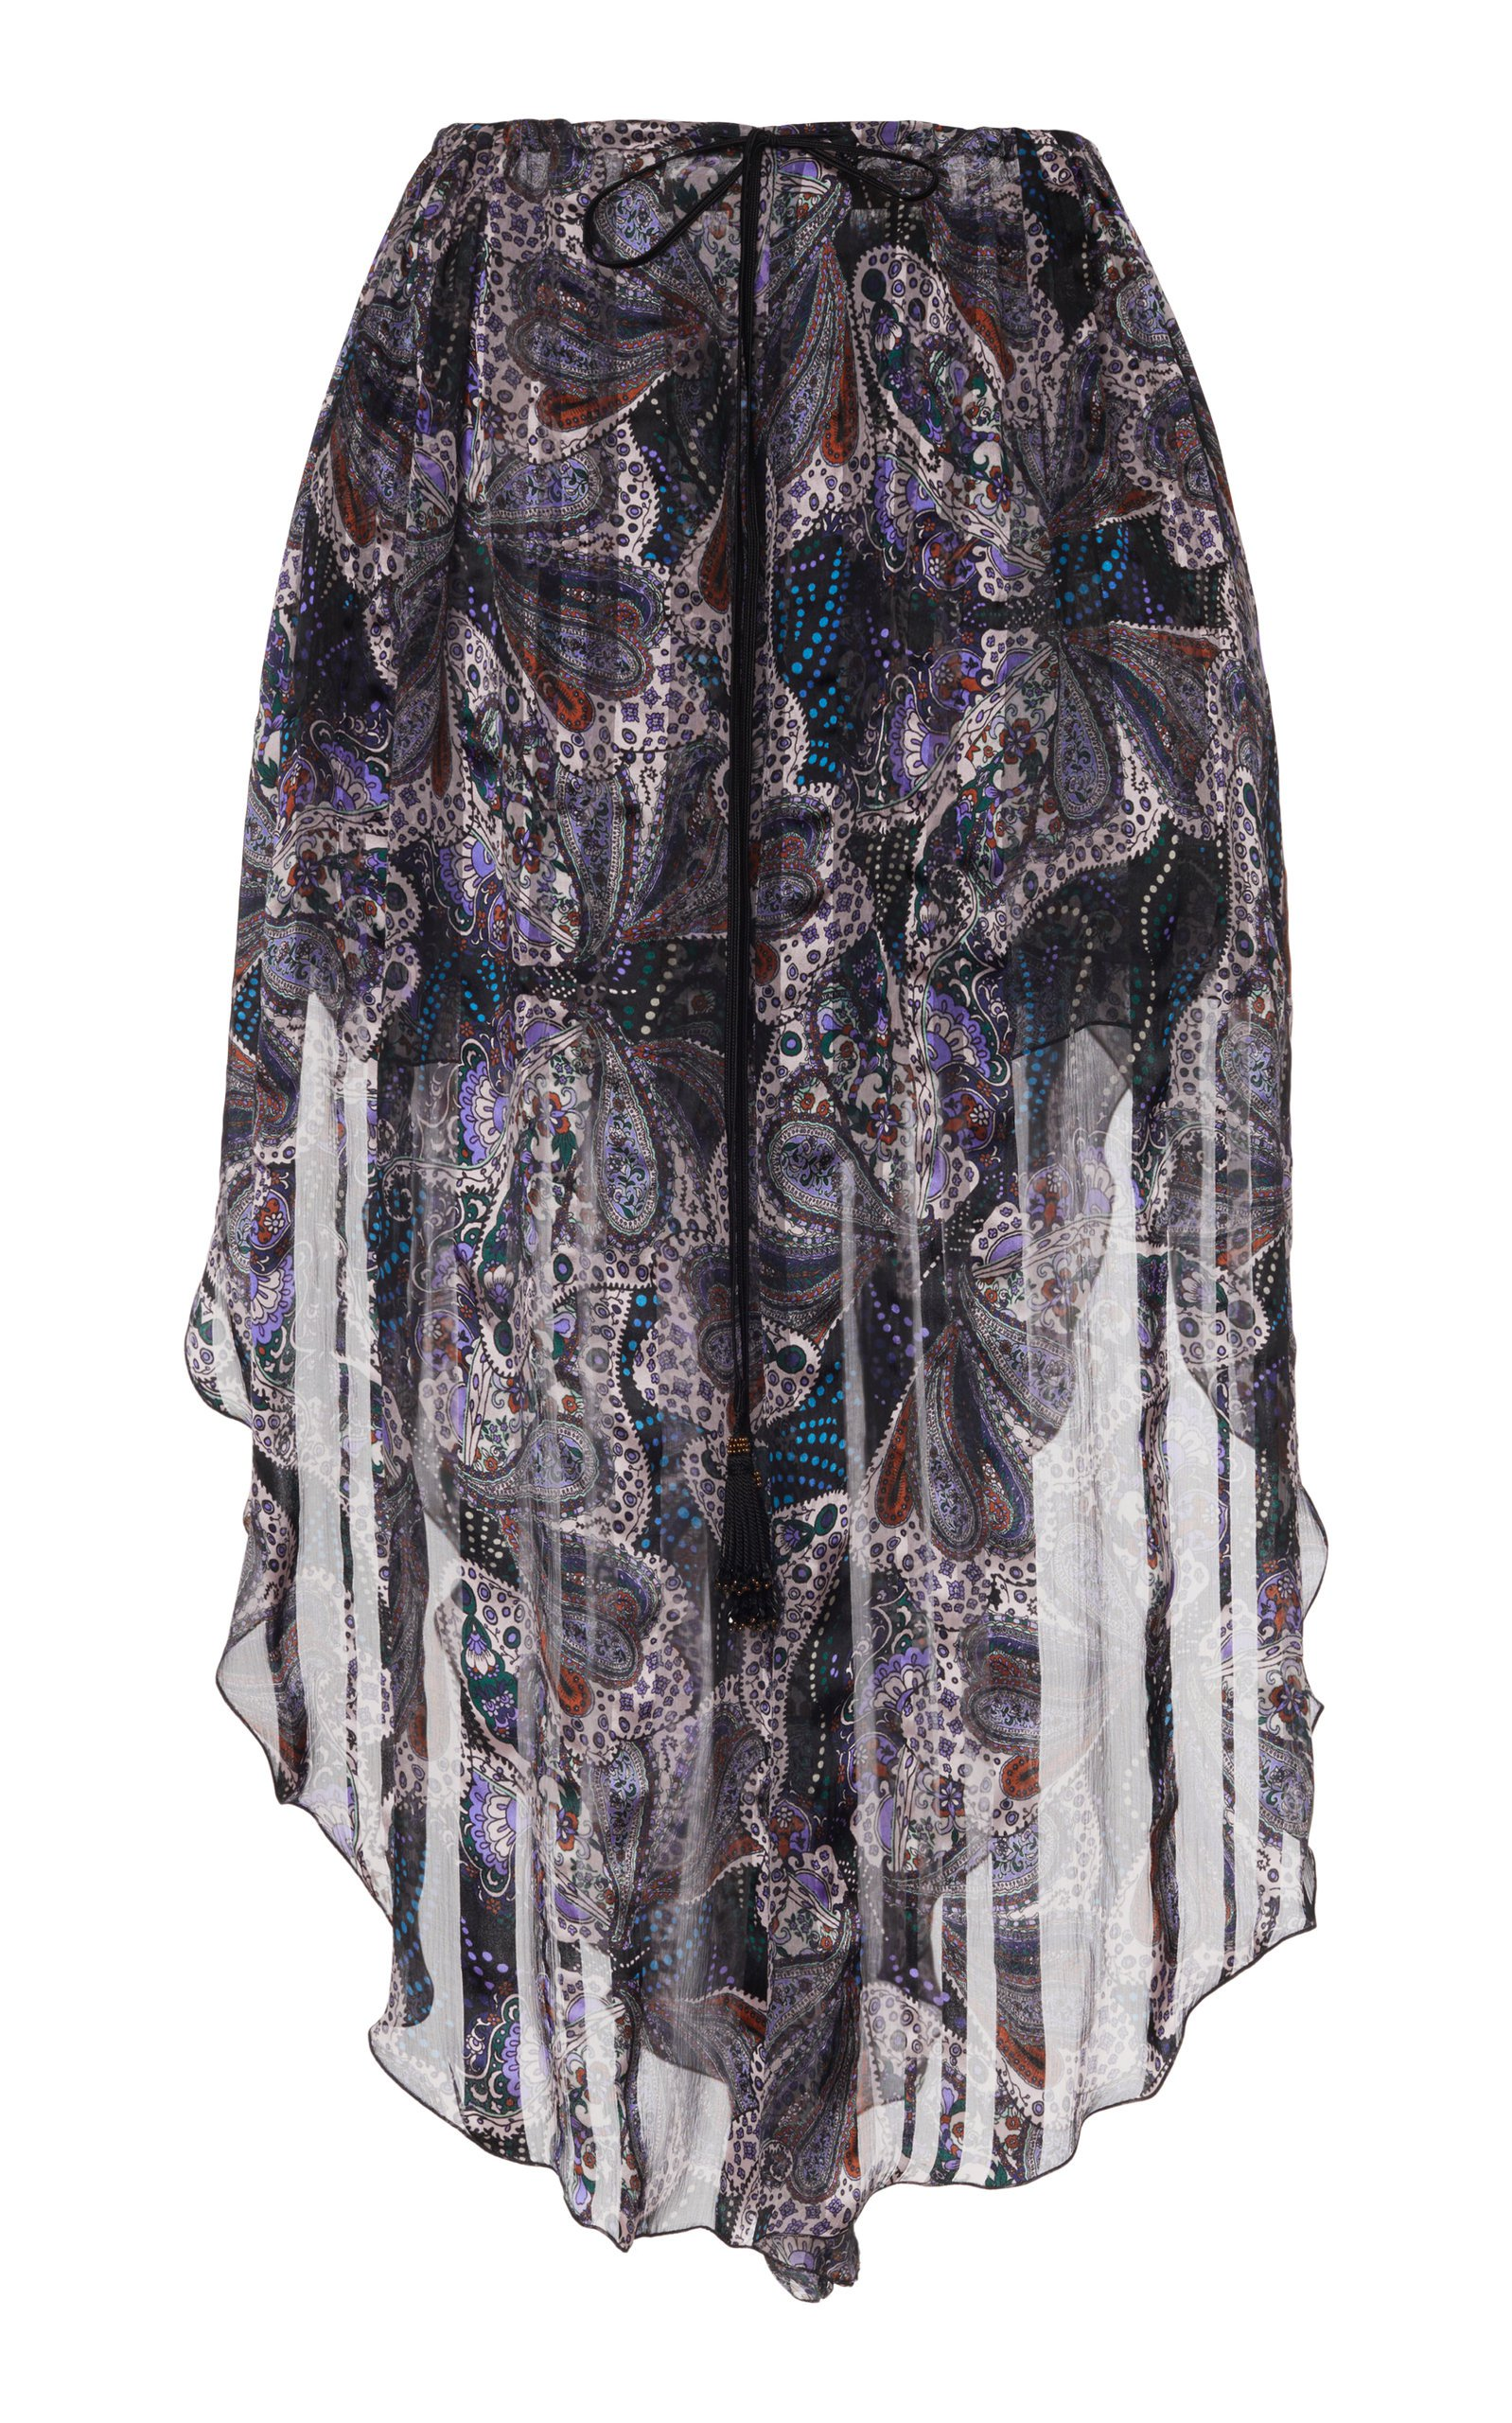 Etro Printed Silk Skirt Size: 38